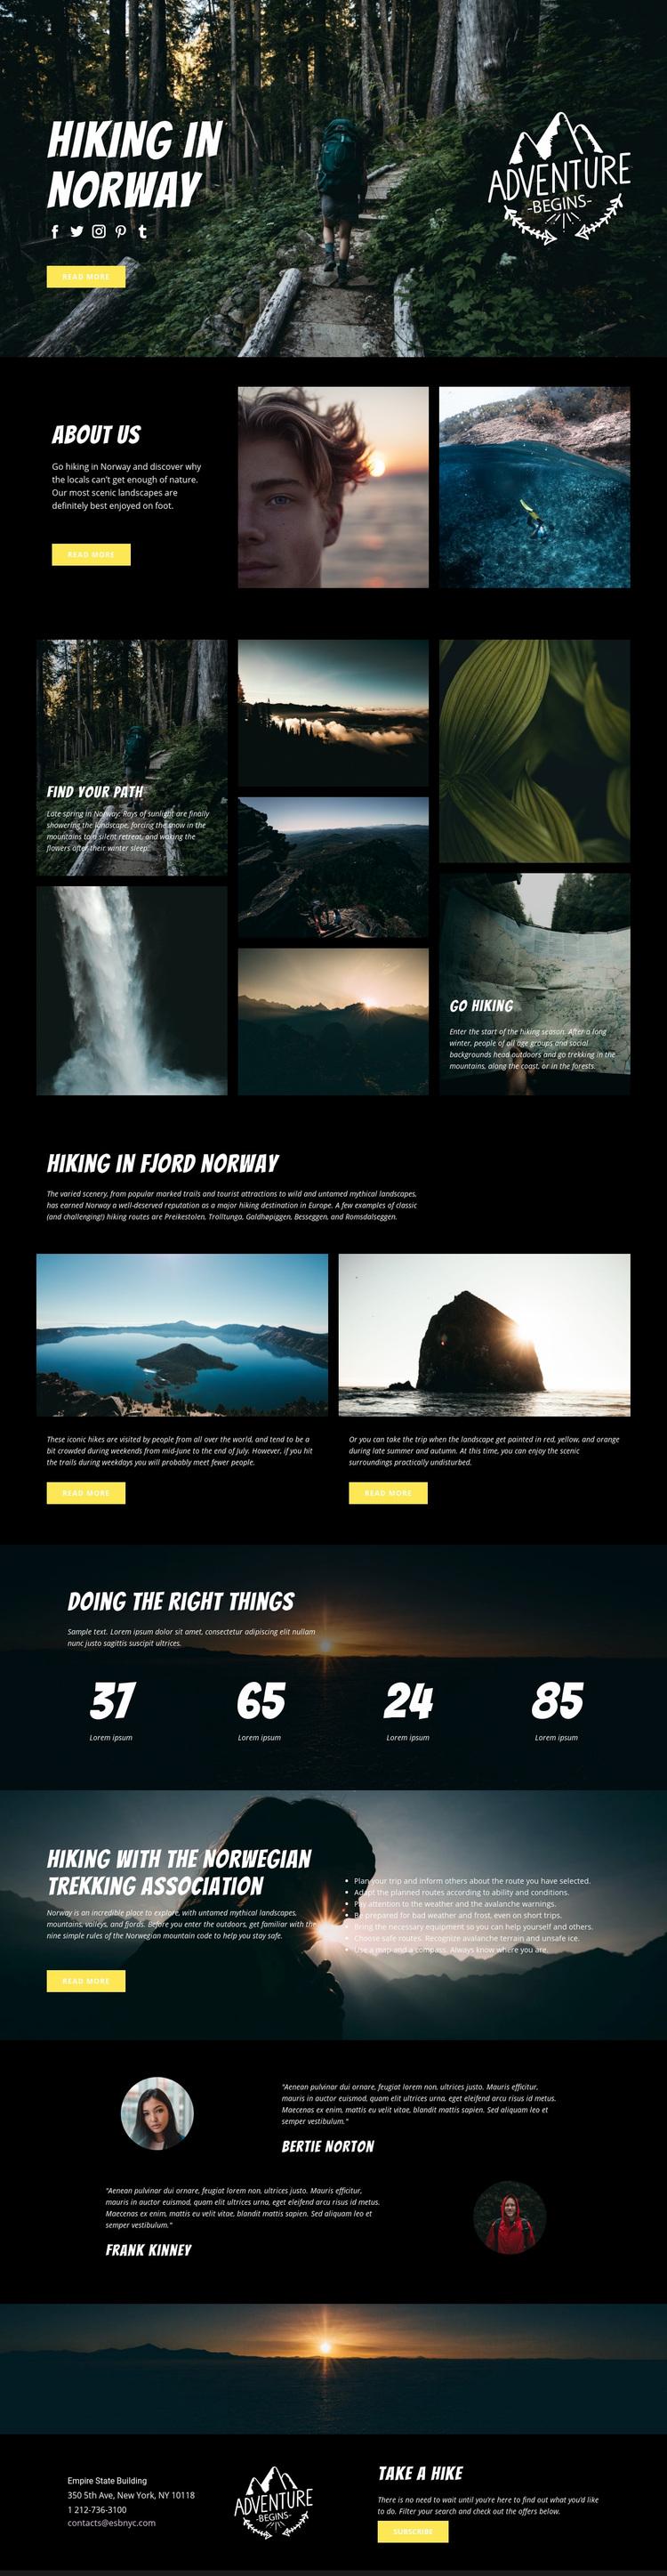 Norway Web Page Designer